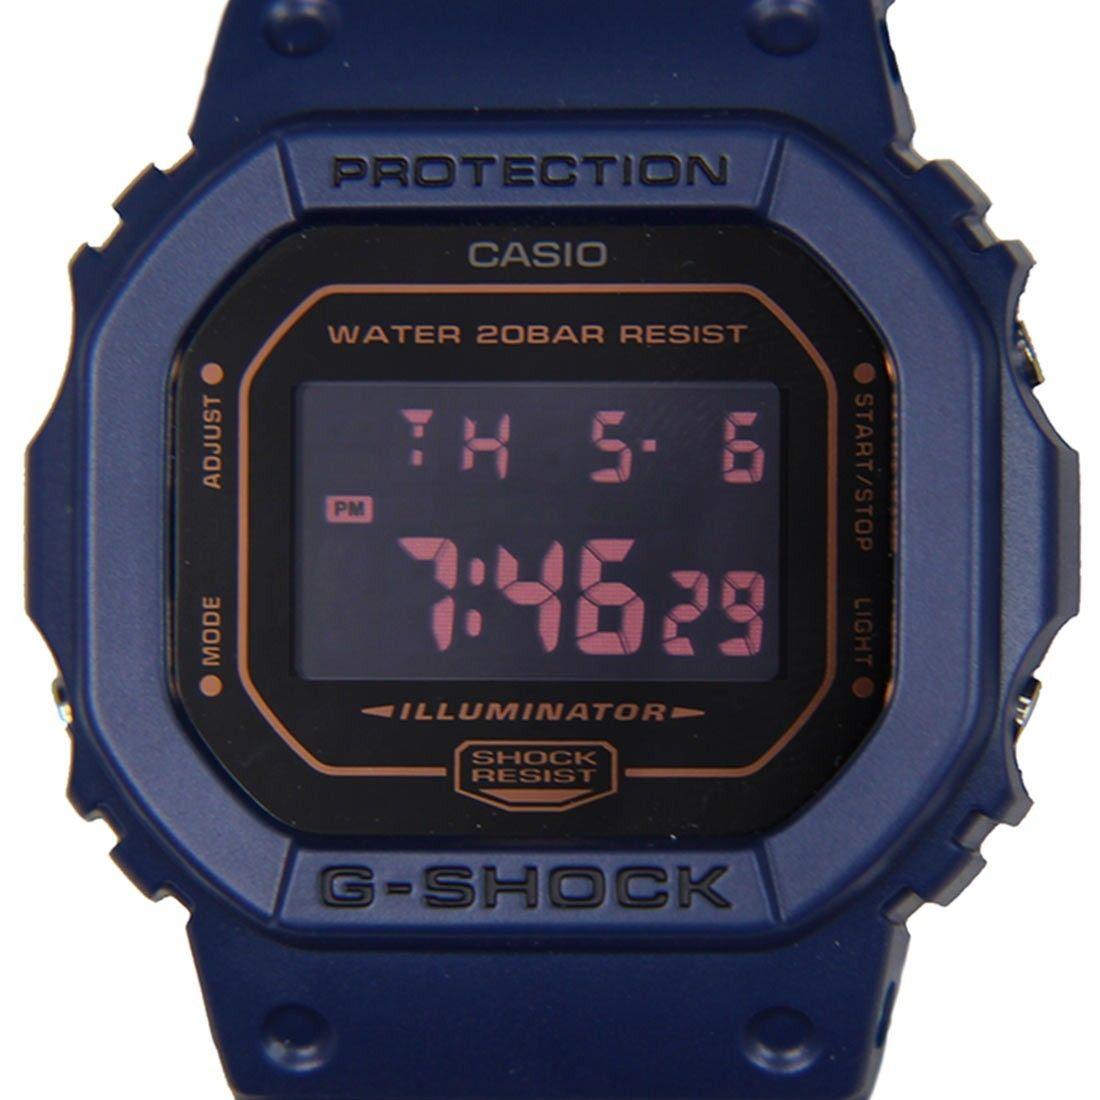 Casio G-Shock Sports Watch DW-5600BBM-2D DW-5600BBM-2 #sportswatches